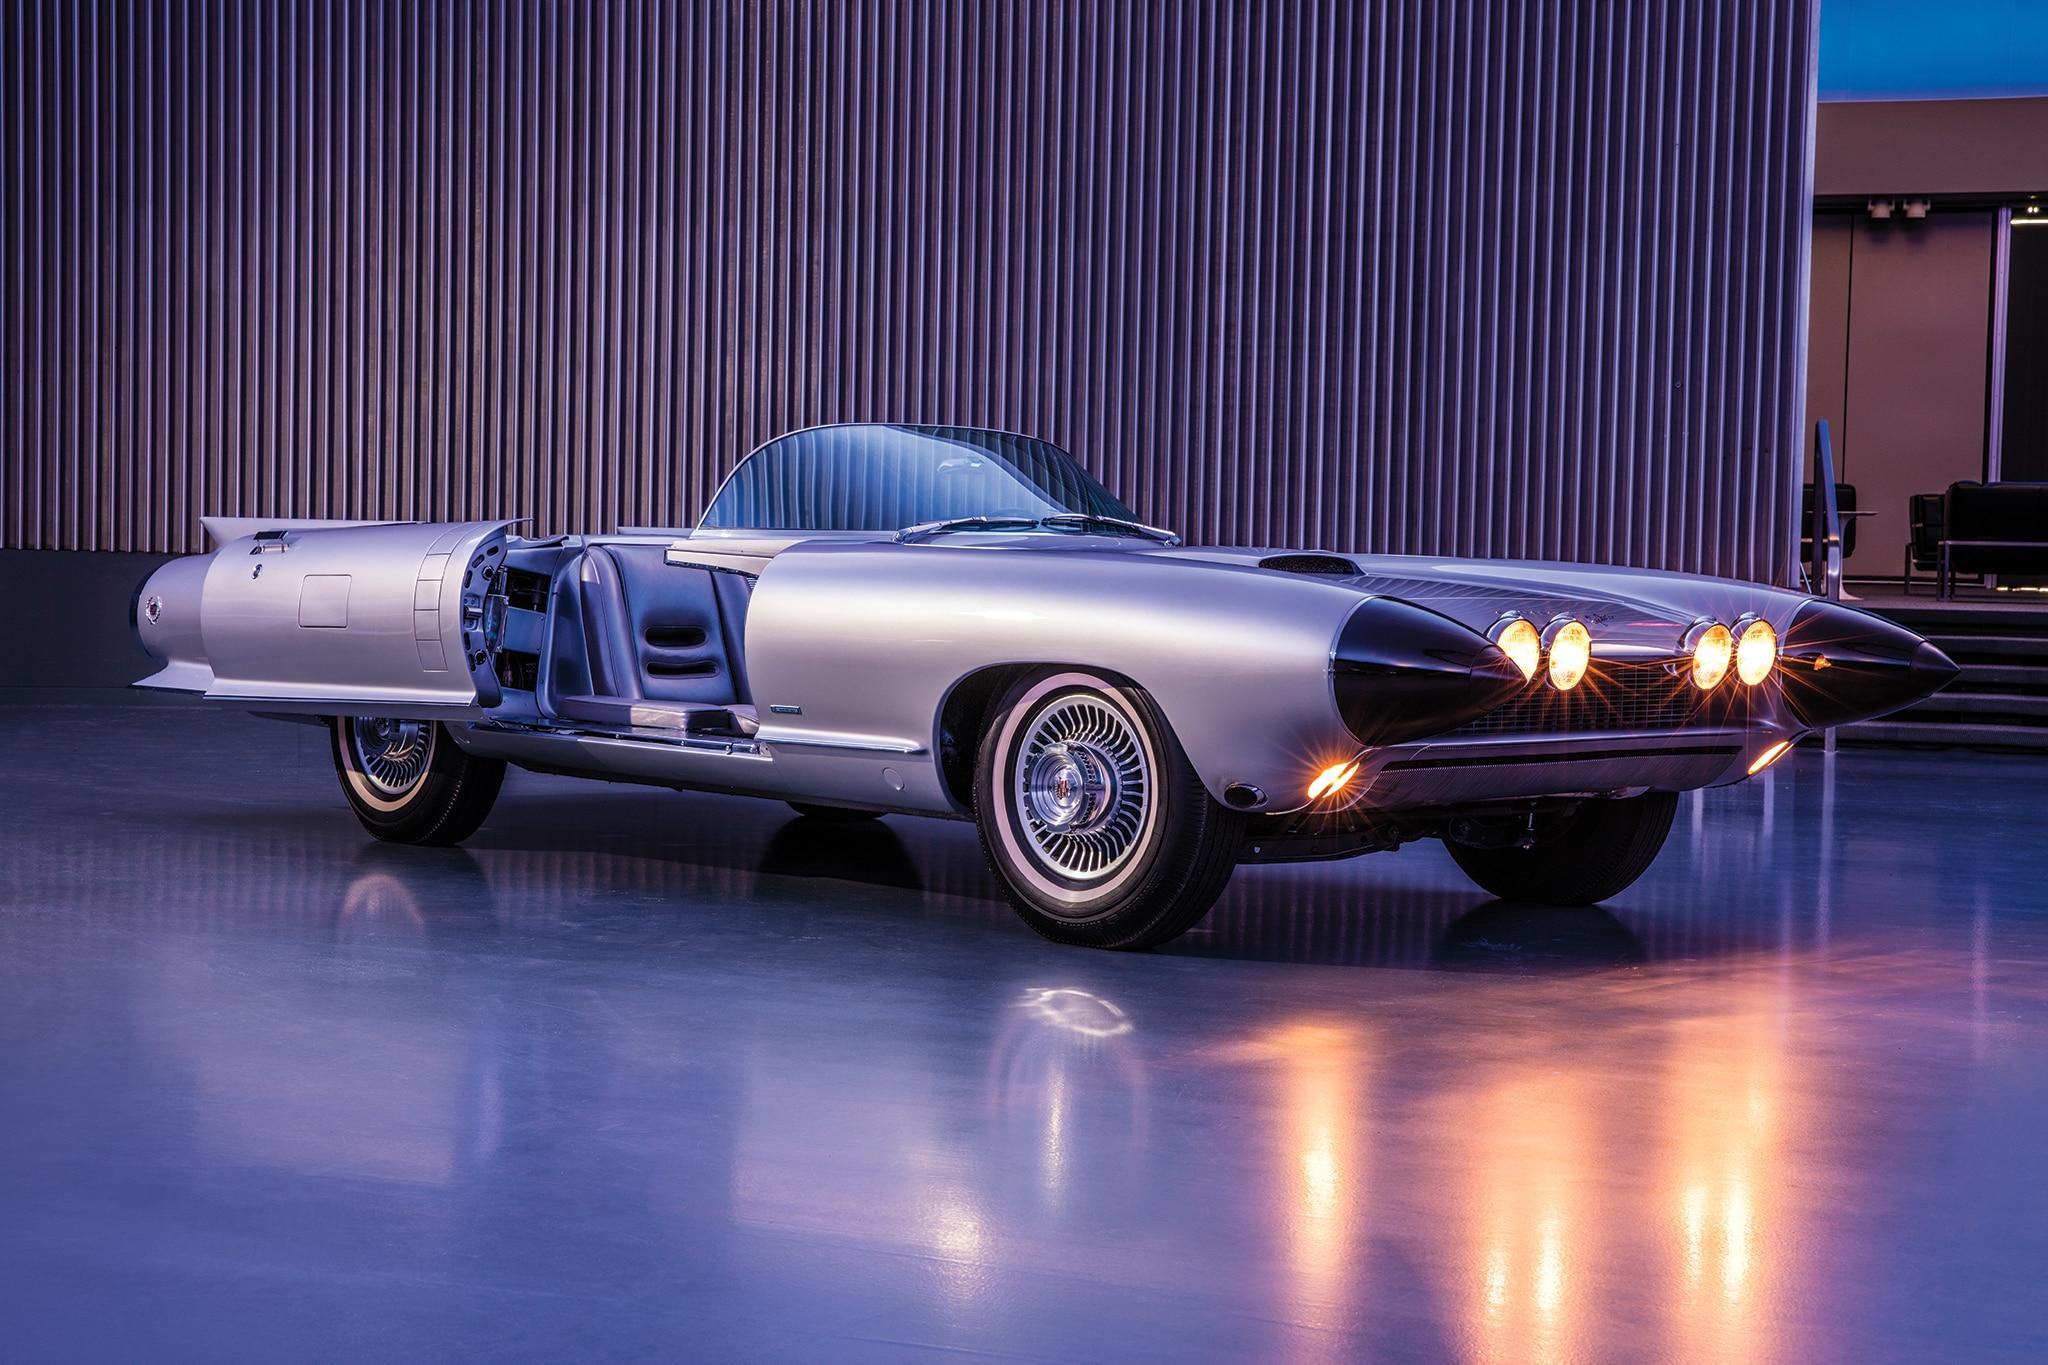 Cadillac Ats Coupe >> Ed Welburn Drives the Cadillac Cyclone | Automobile Magazine